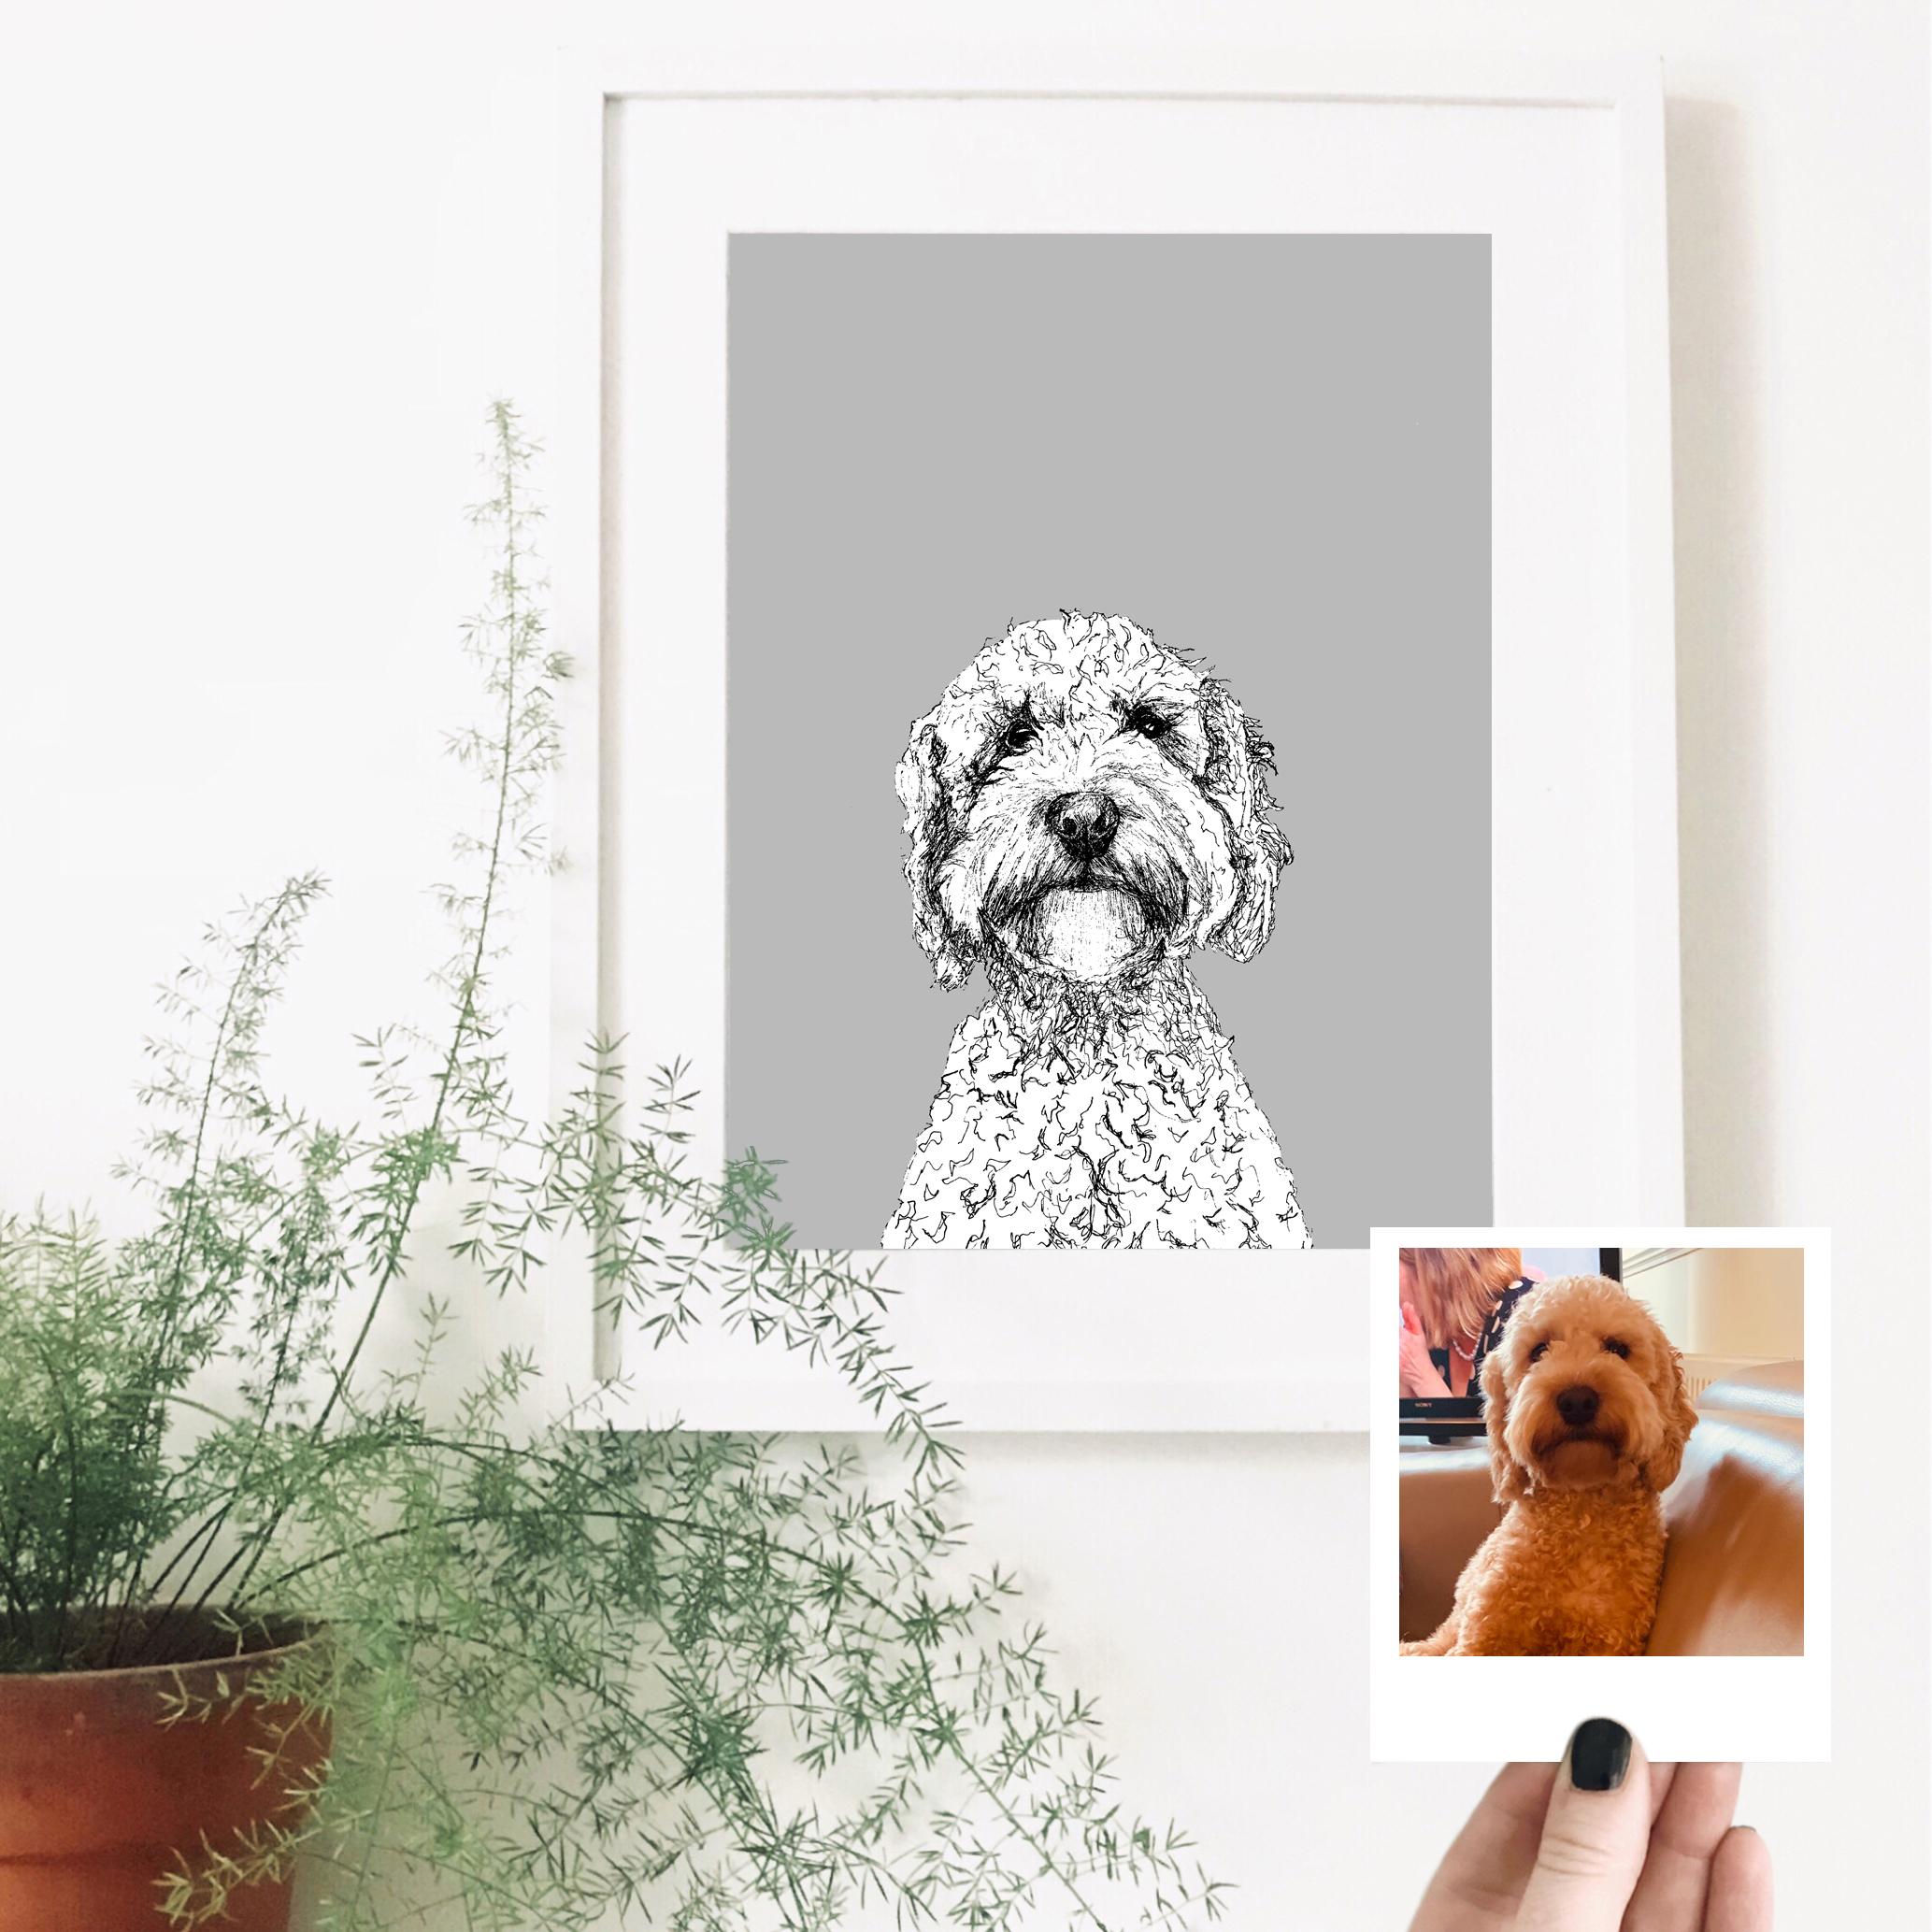 cockapoo-dog-pet-portrait.jpg